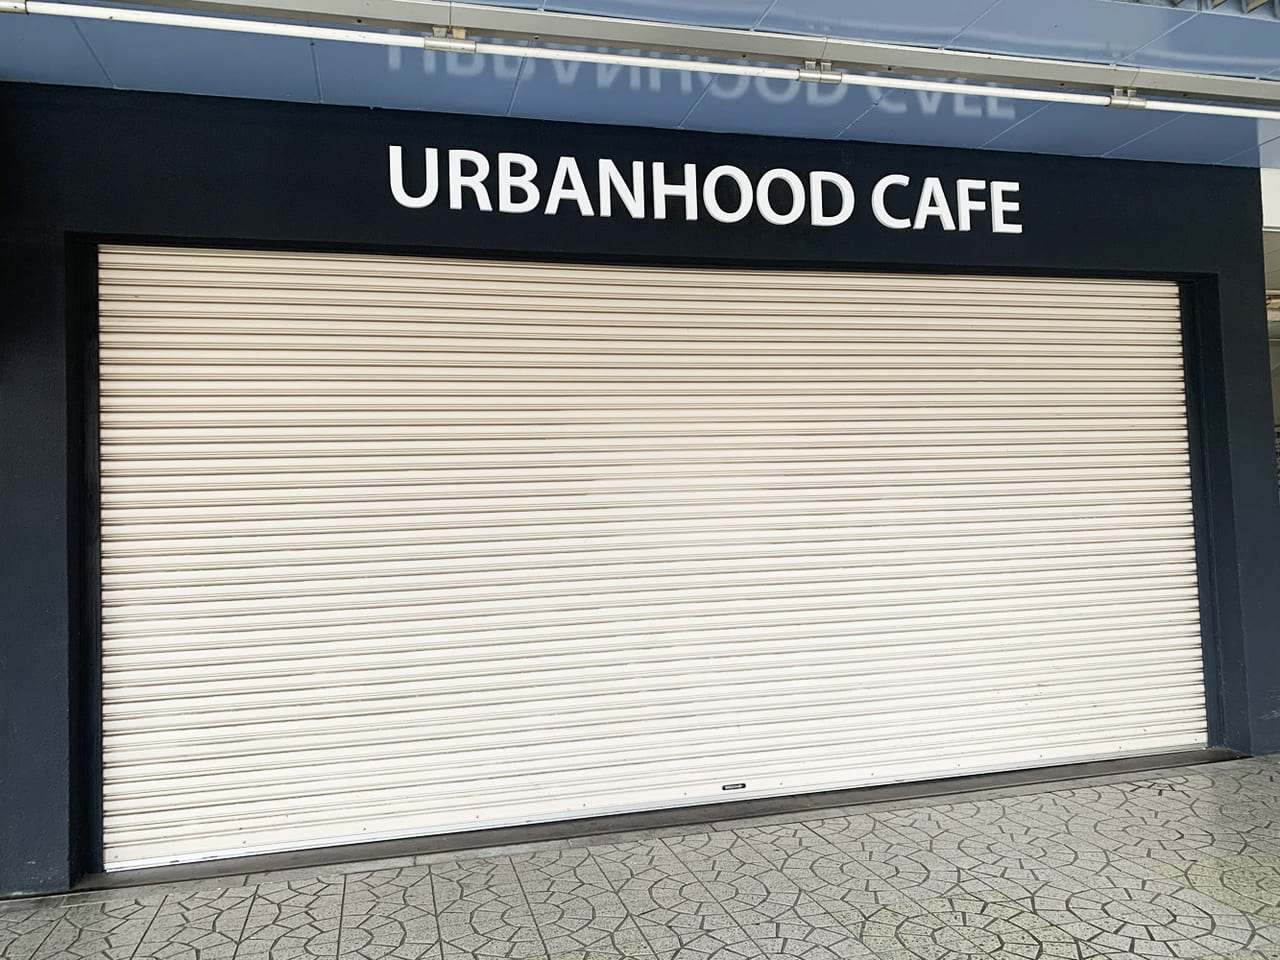 URBANHOODCAFE(アーバンフッドカフェ)